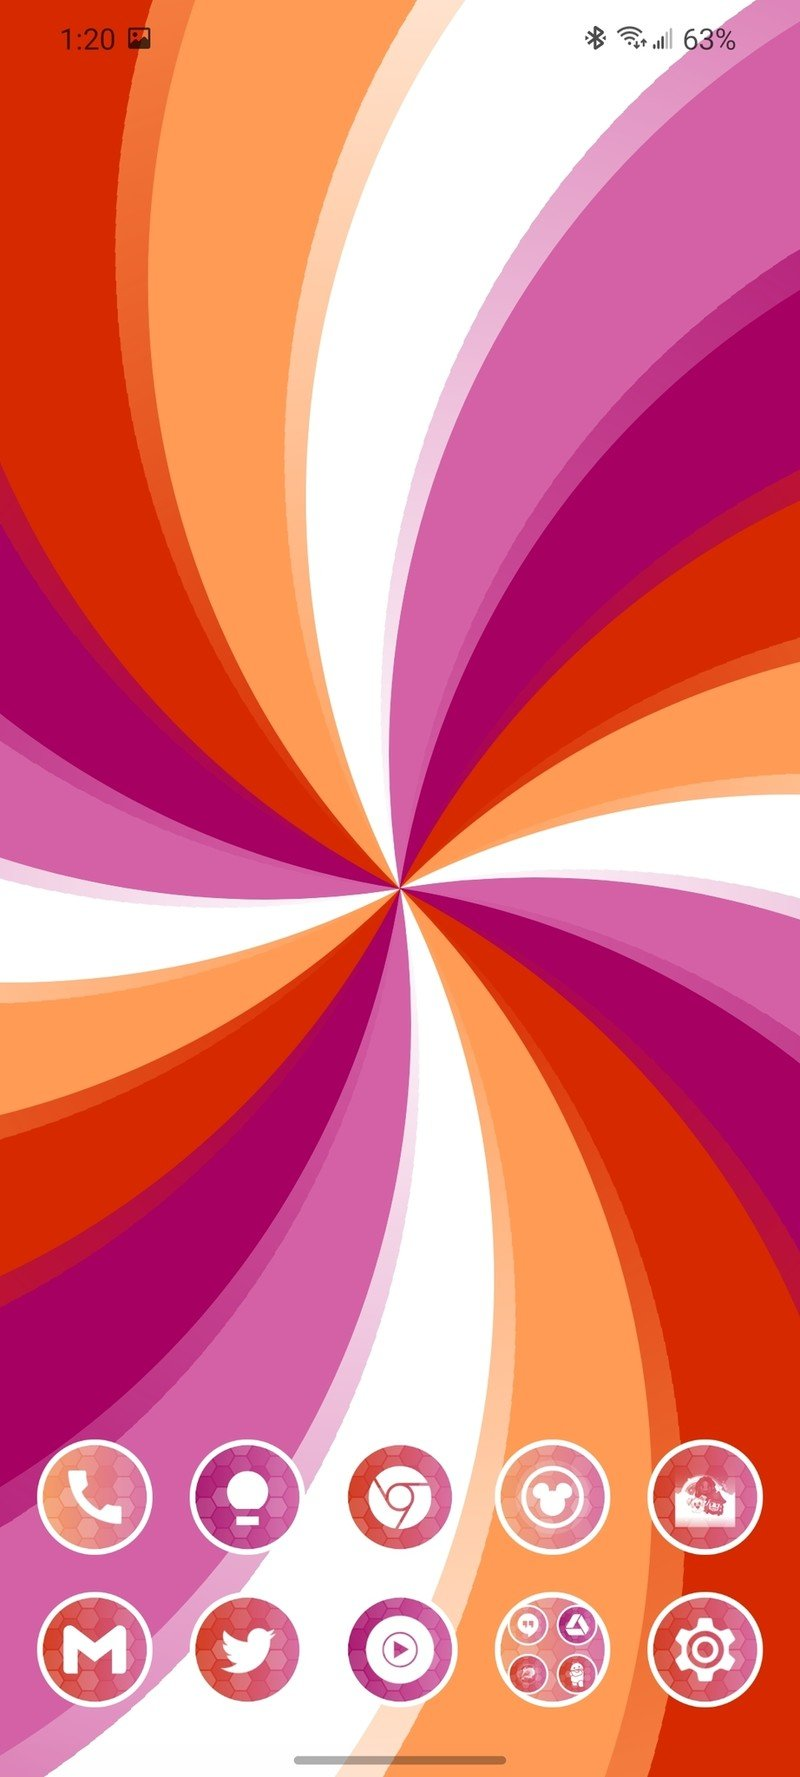 adding-kwgt-to-pride-theme-1.jpg